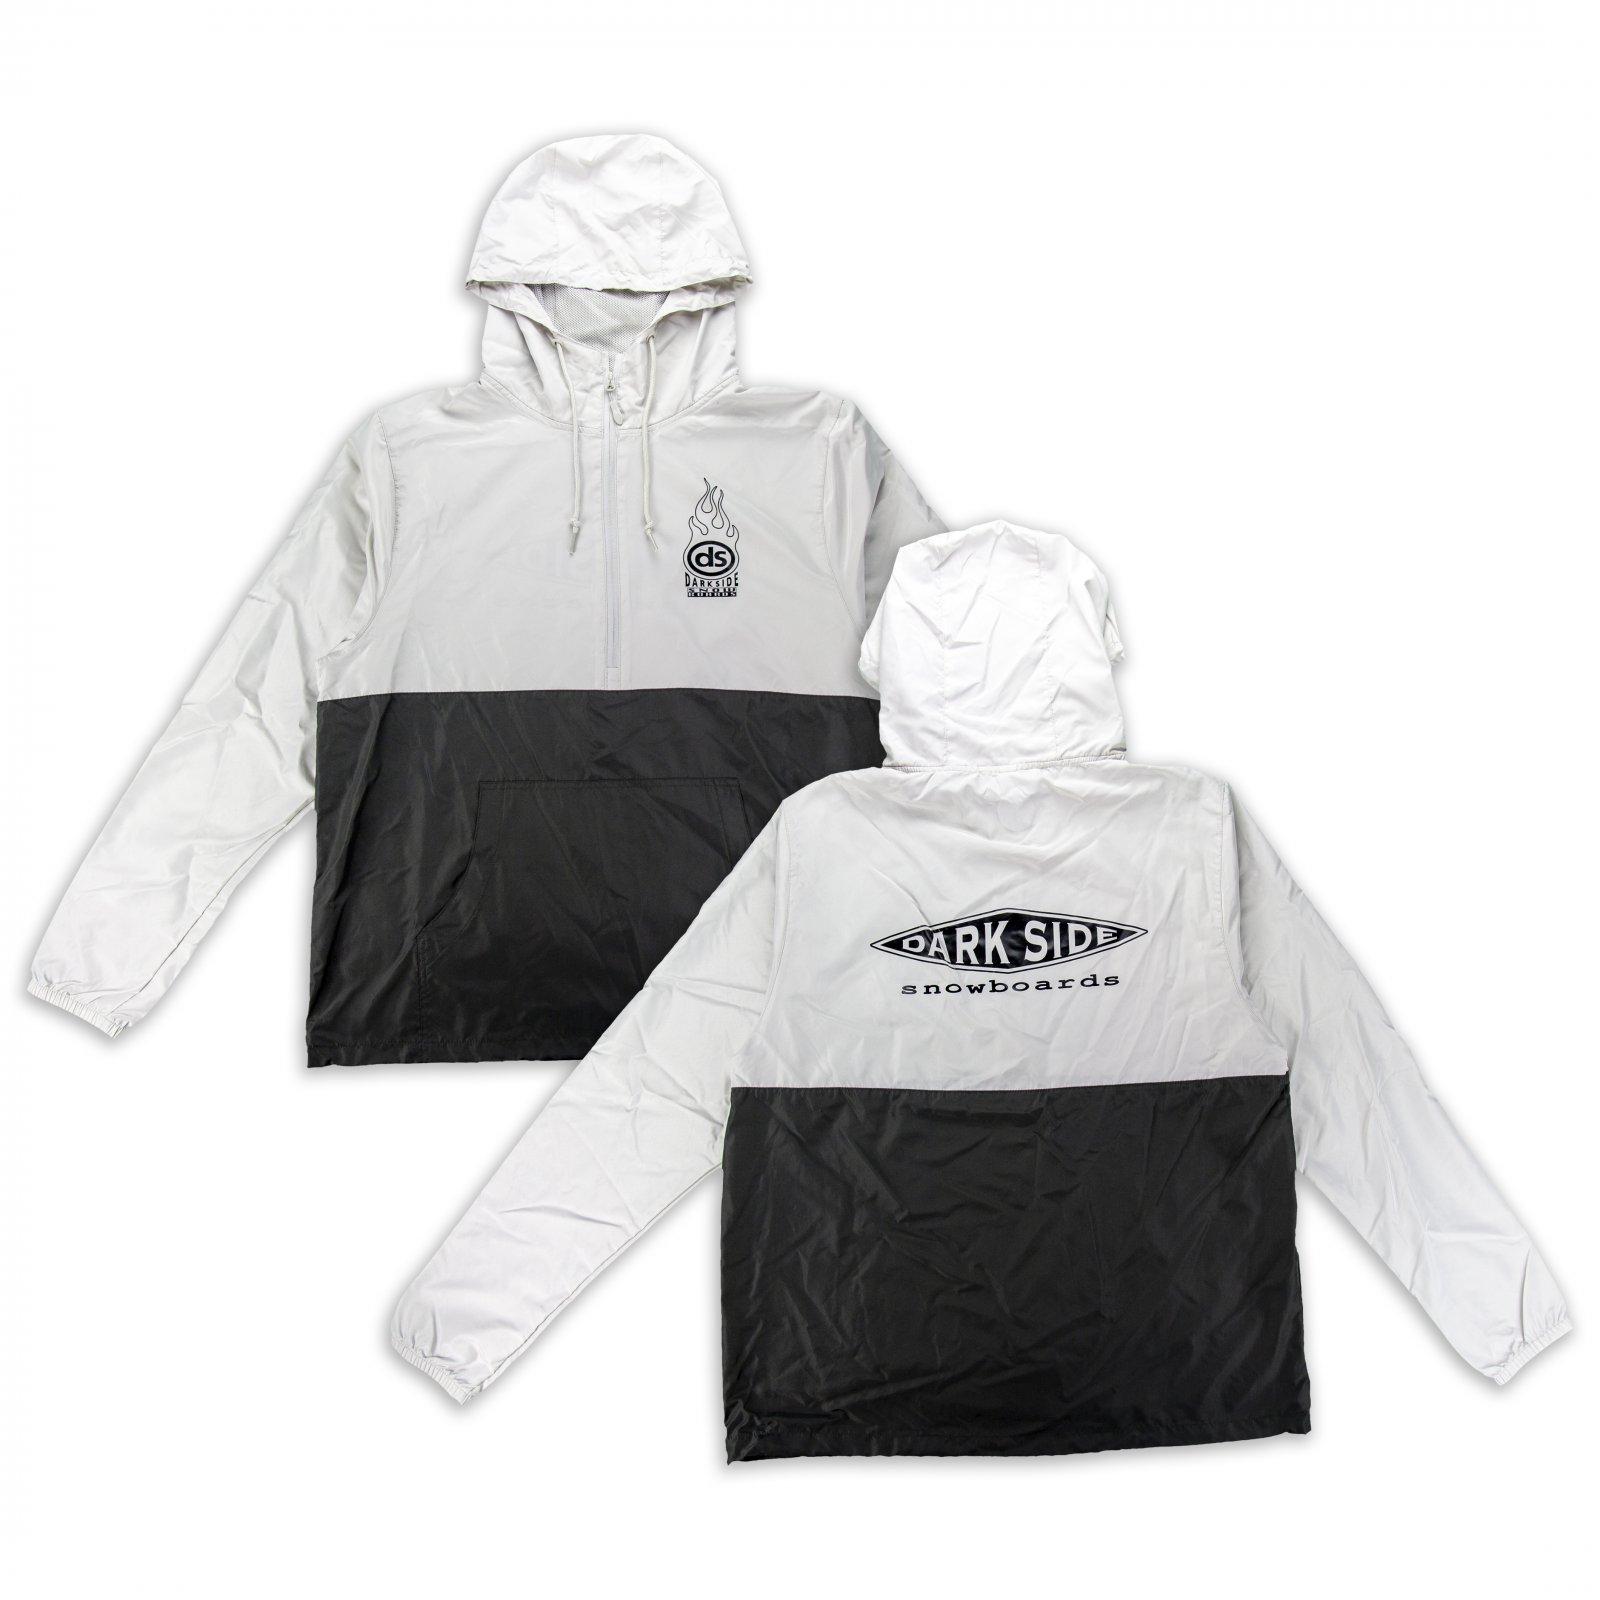 Darkside OG Diamond and Flame Lightweight Anorak Jacket